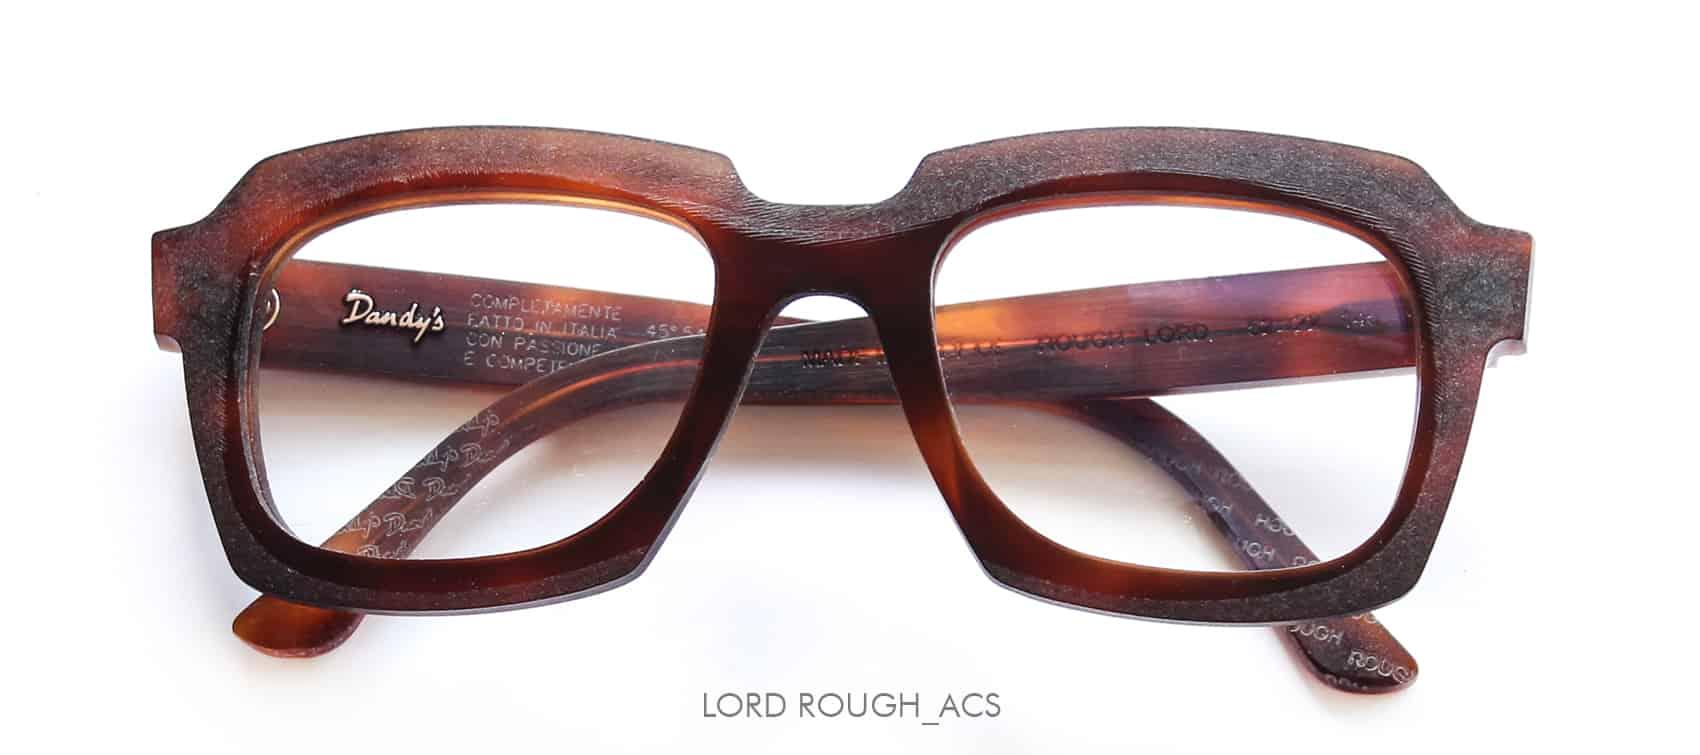 Dandy's eyewear Lord Avana, Rough version